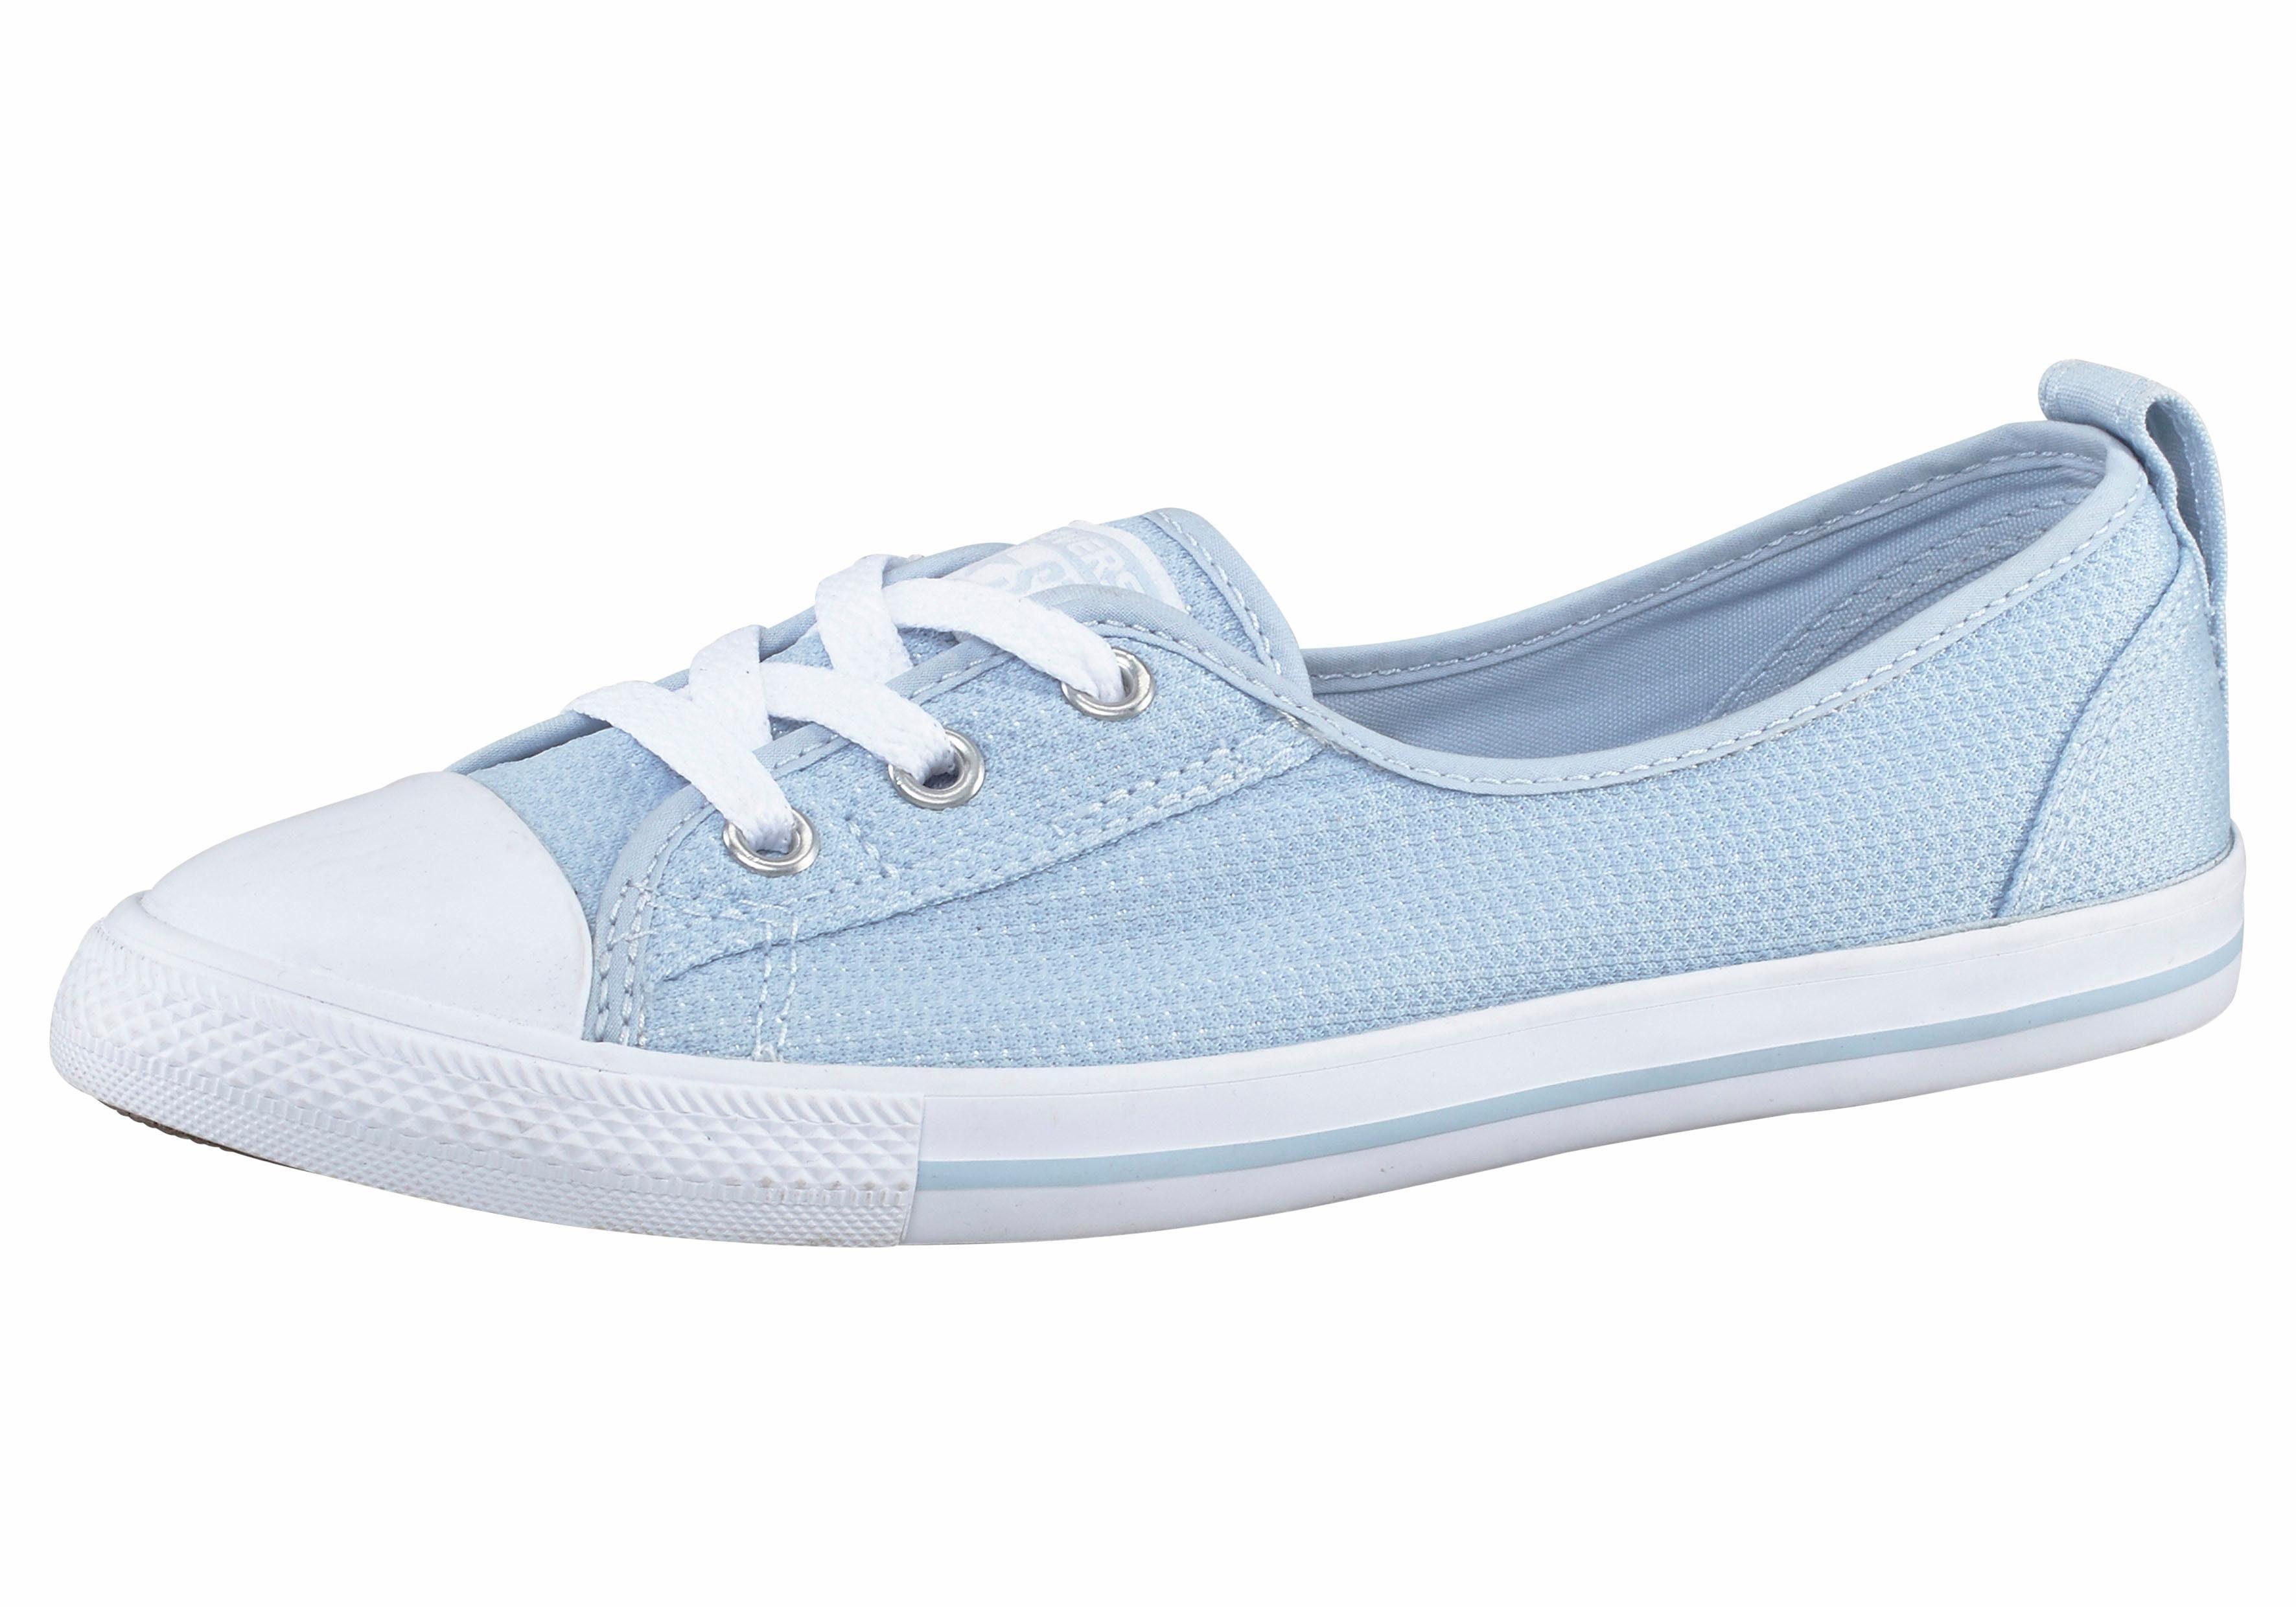 Converse Chuck Taylor All Star Coral Sneaker  hellblau